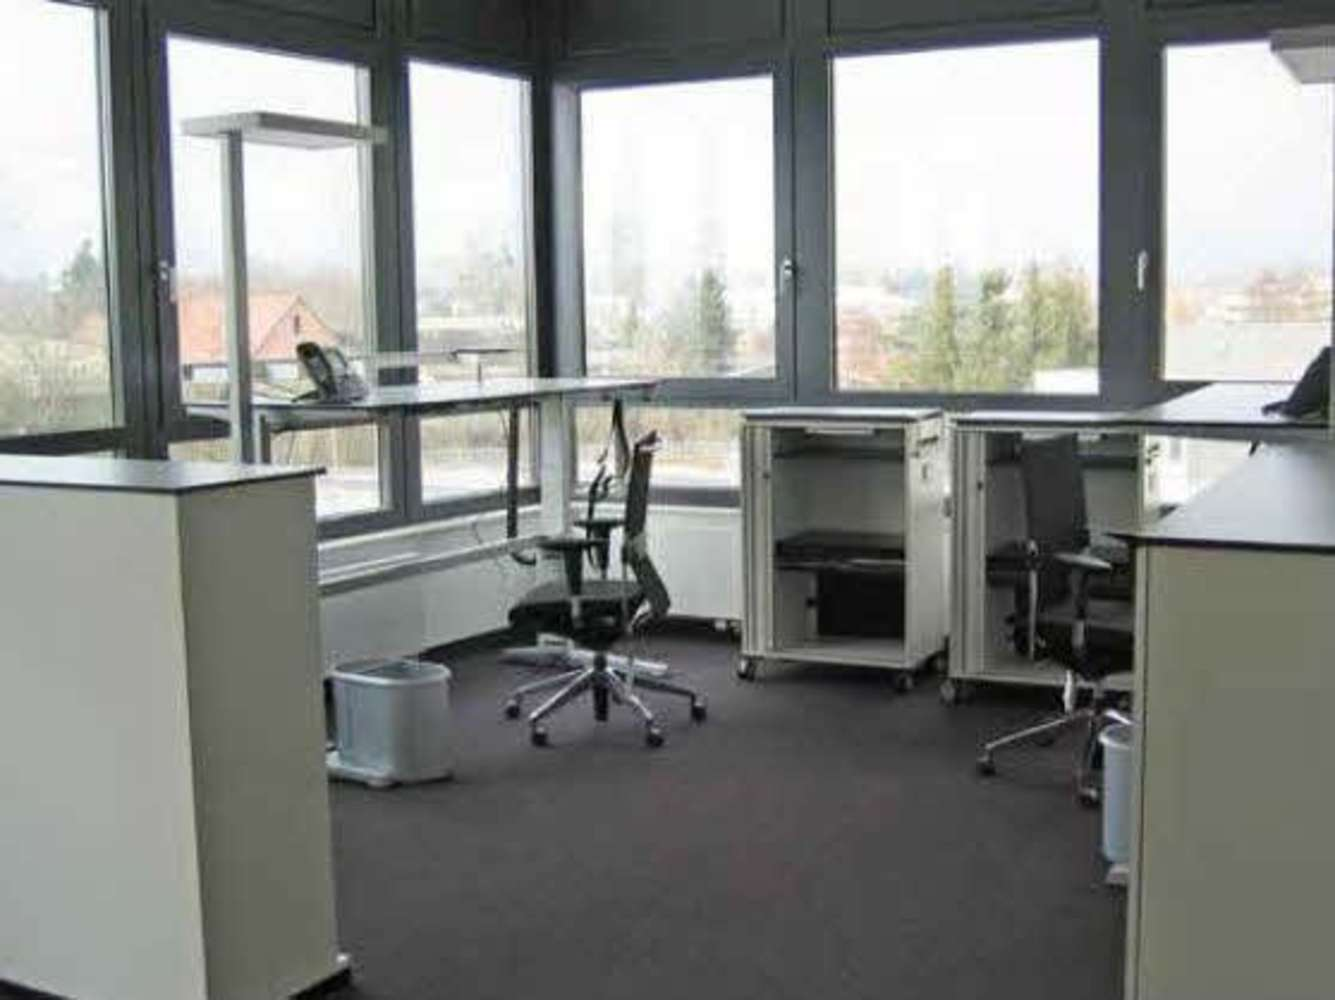 Büros Bad homburg, 61352 - Büro - Bad Homburg - F1859 - 9917277